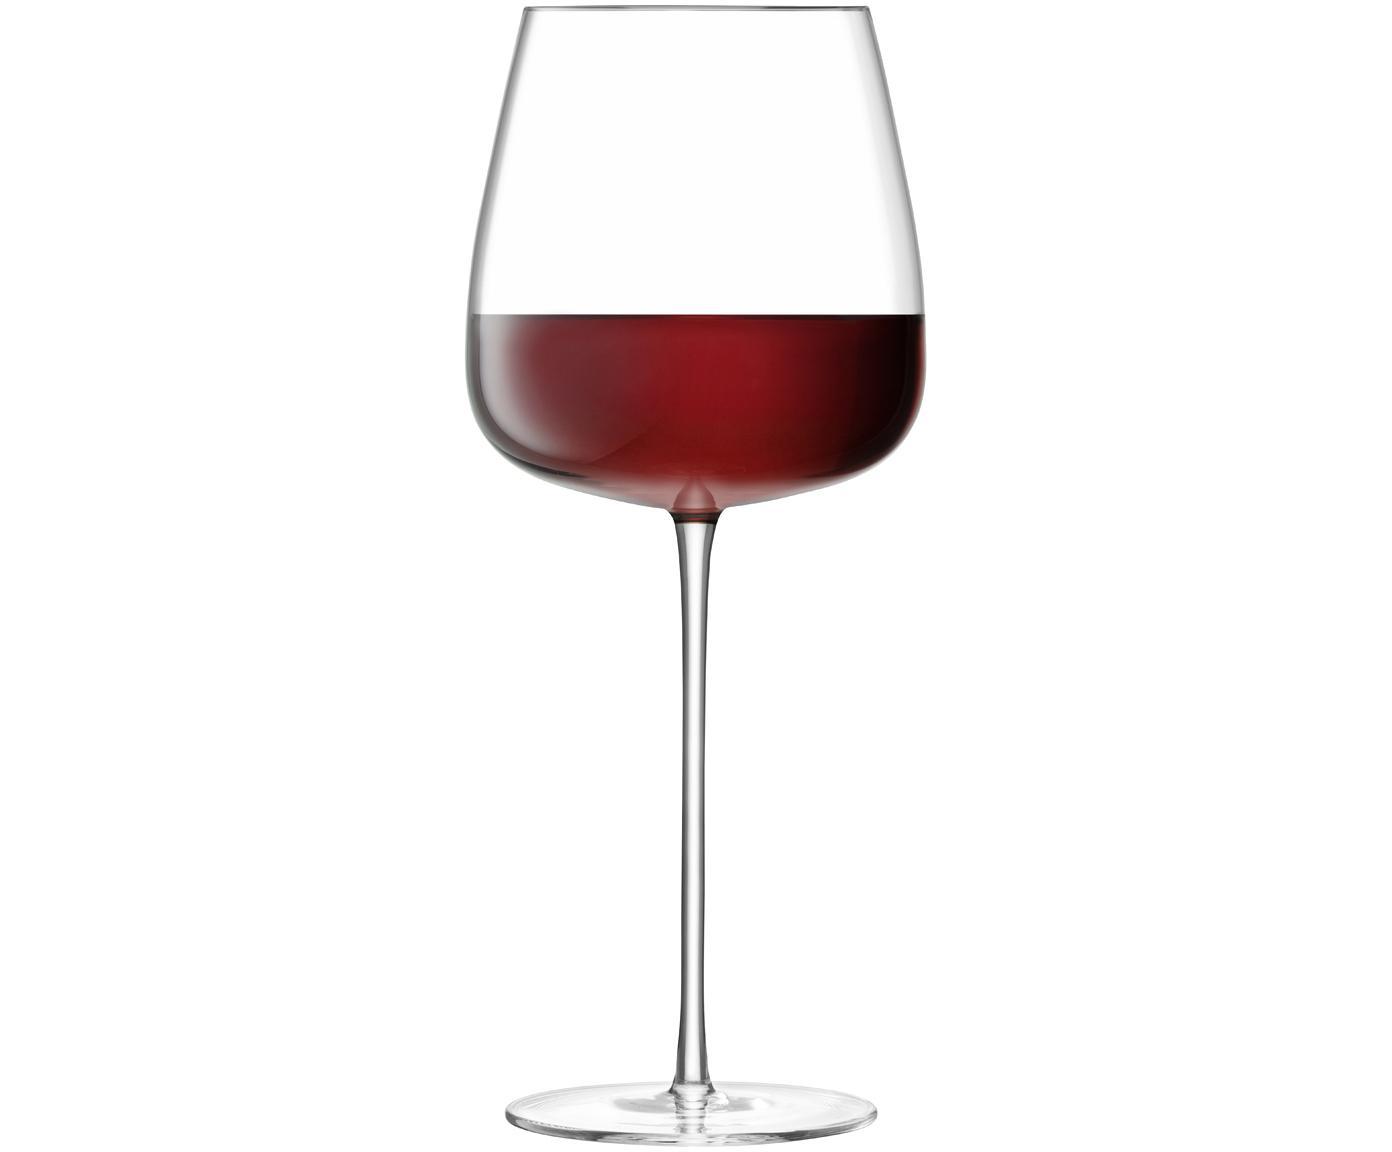 Copas de vino tinto de vidrio soplado Wine Culture, 2uds., Vidrio, Transparente, Ø 11 x Al 26 cm